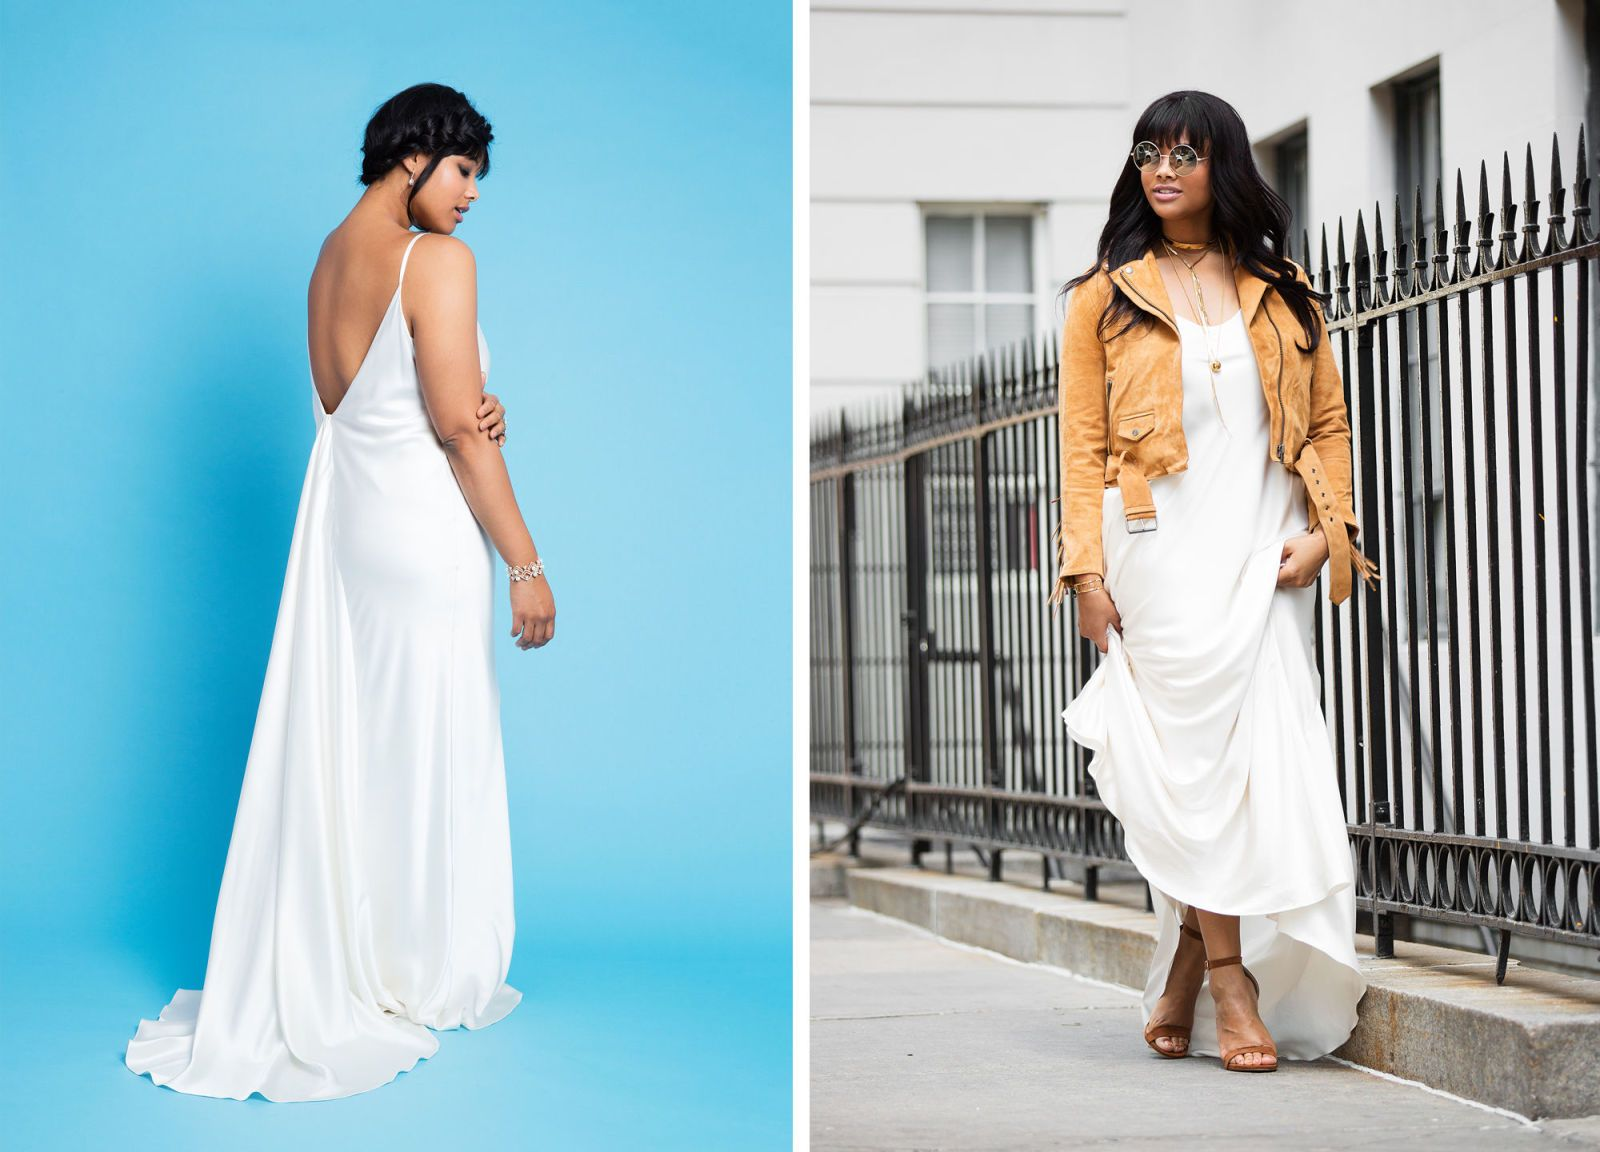 10 Stunning Ways to Rewear Your Wedding Dress | Choker necklaces ...